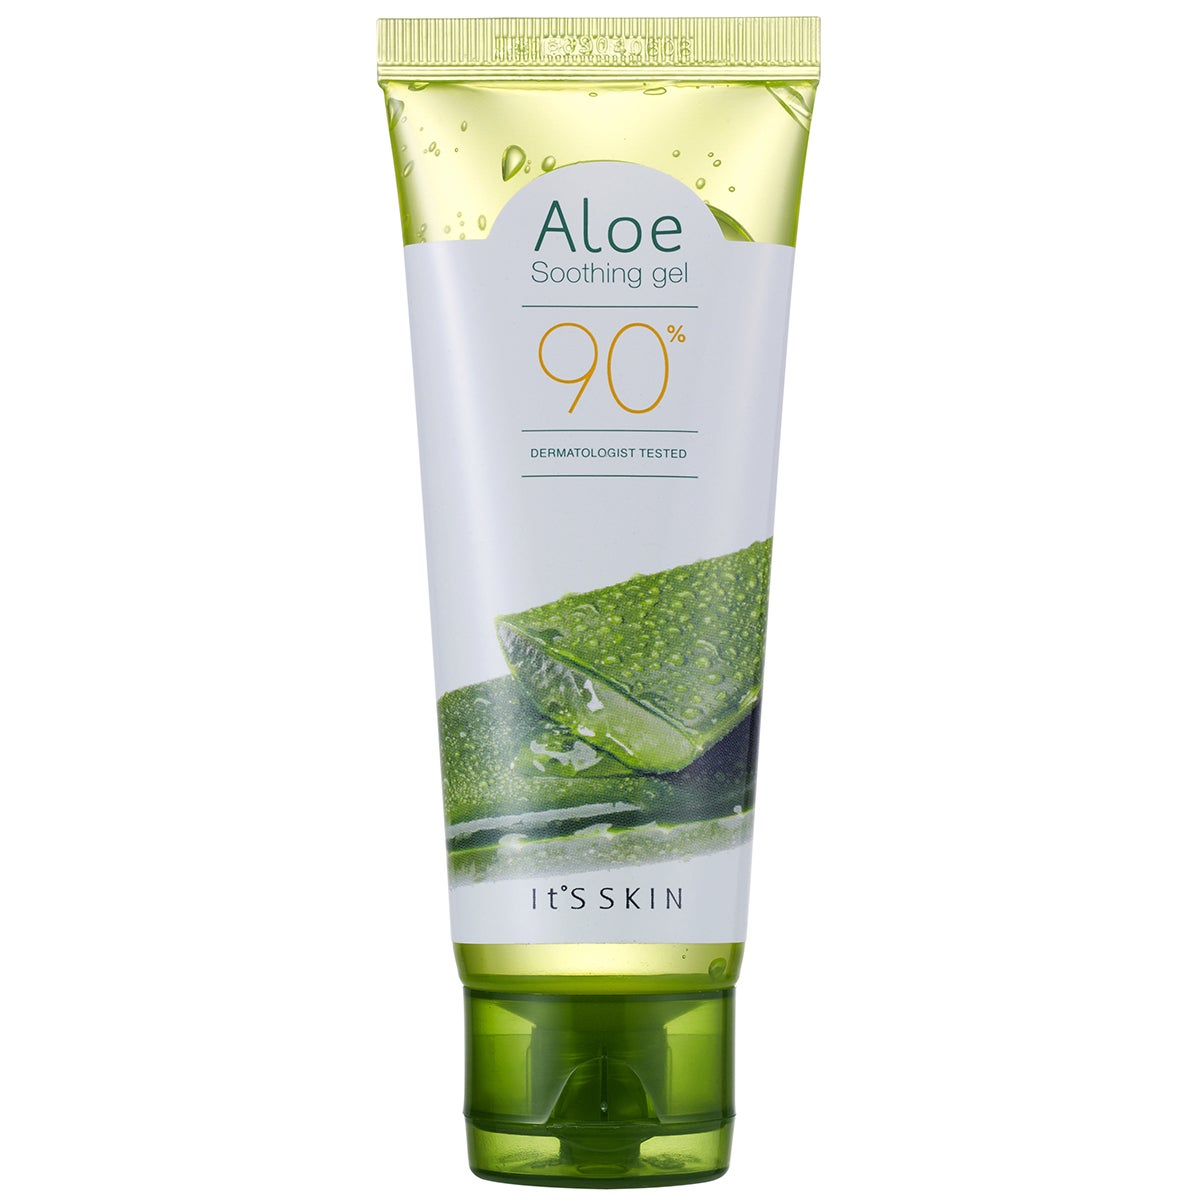 Aloe 90% Soothing Gel,  It'S SKIN Kroppslotion